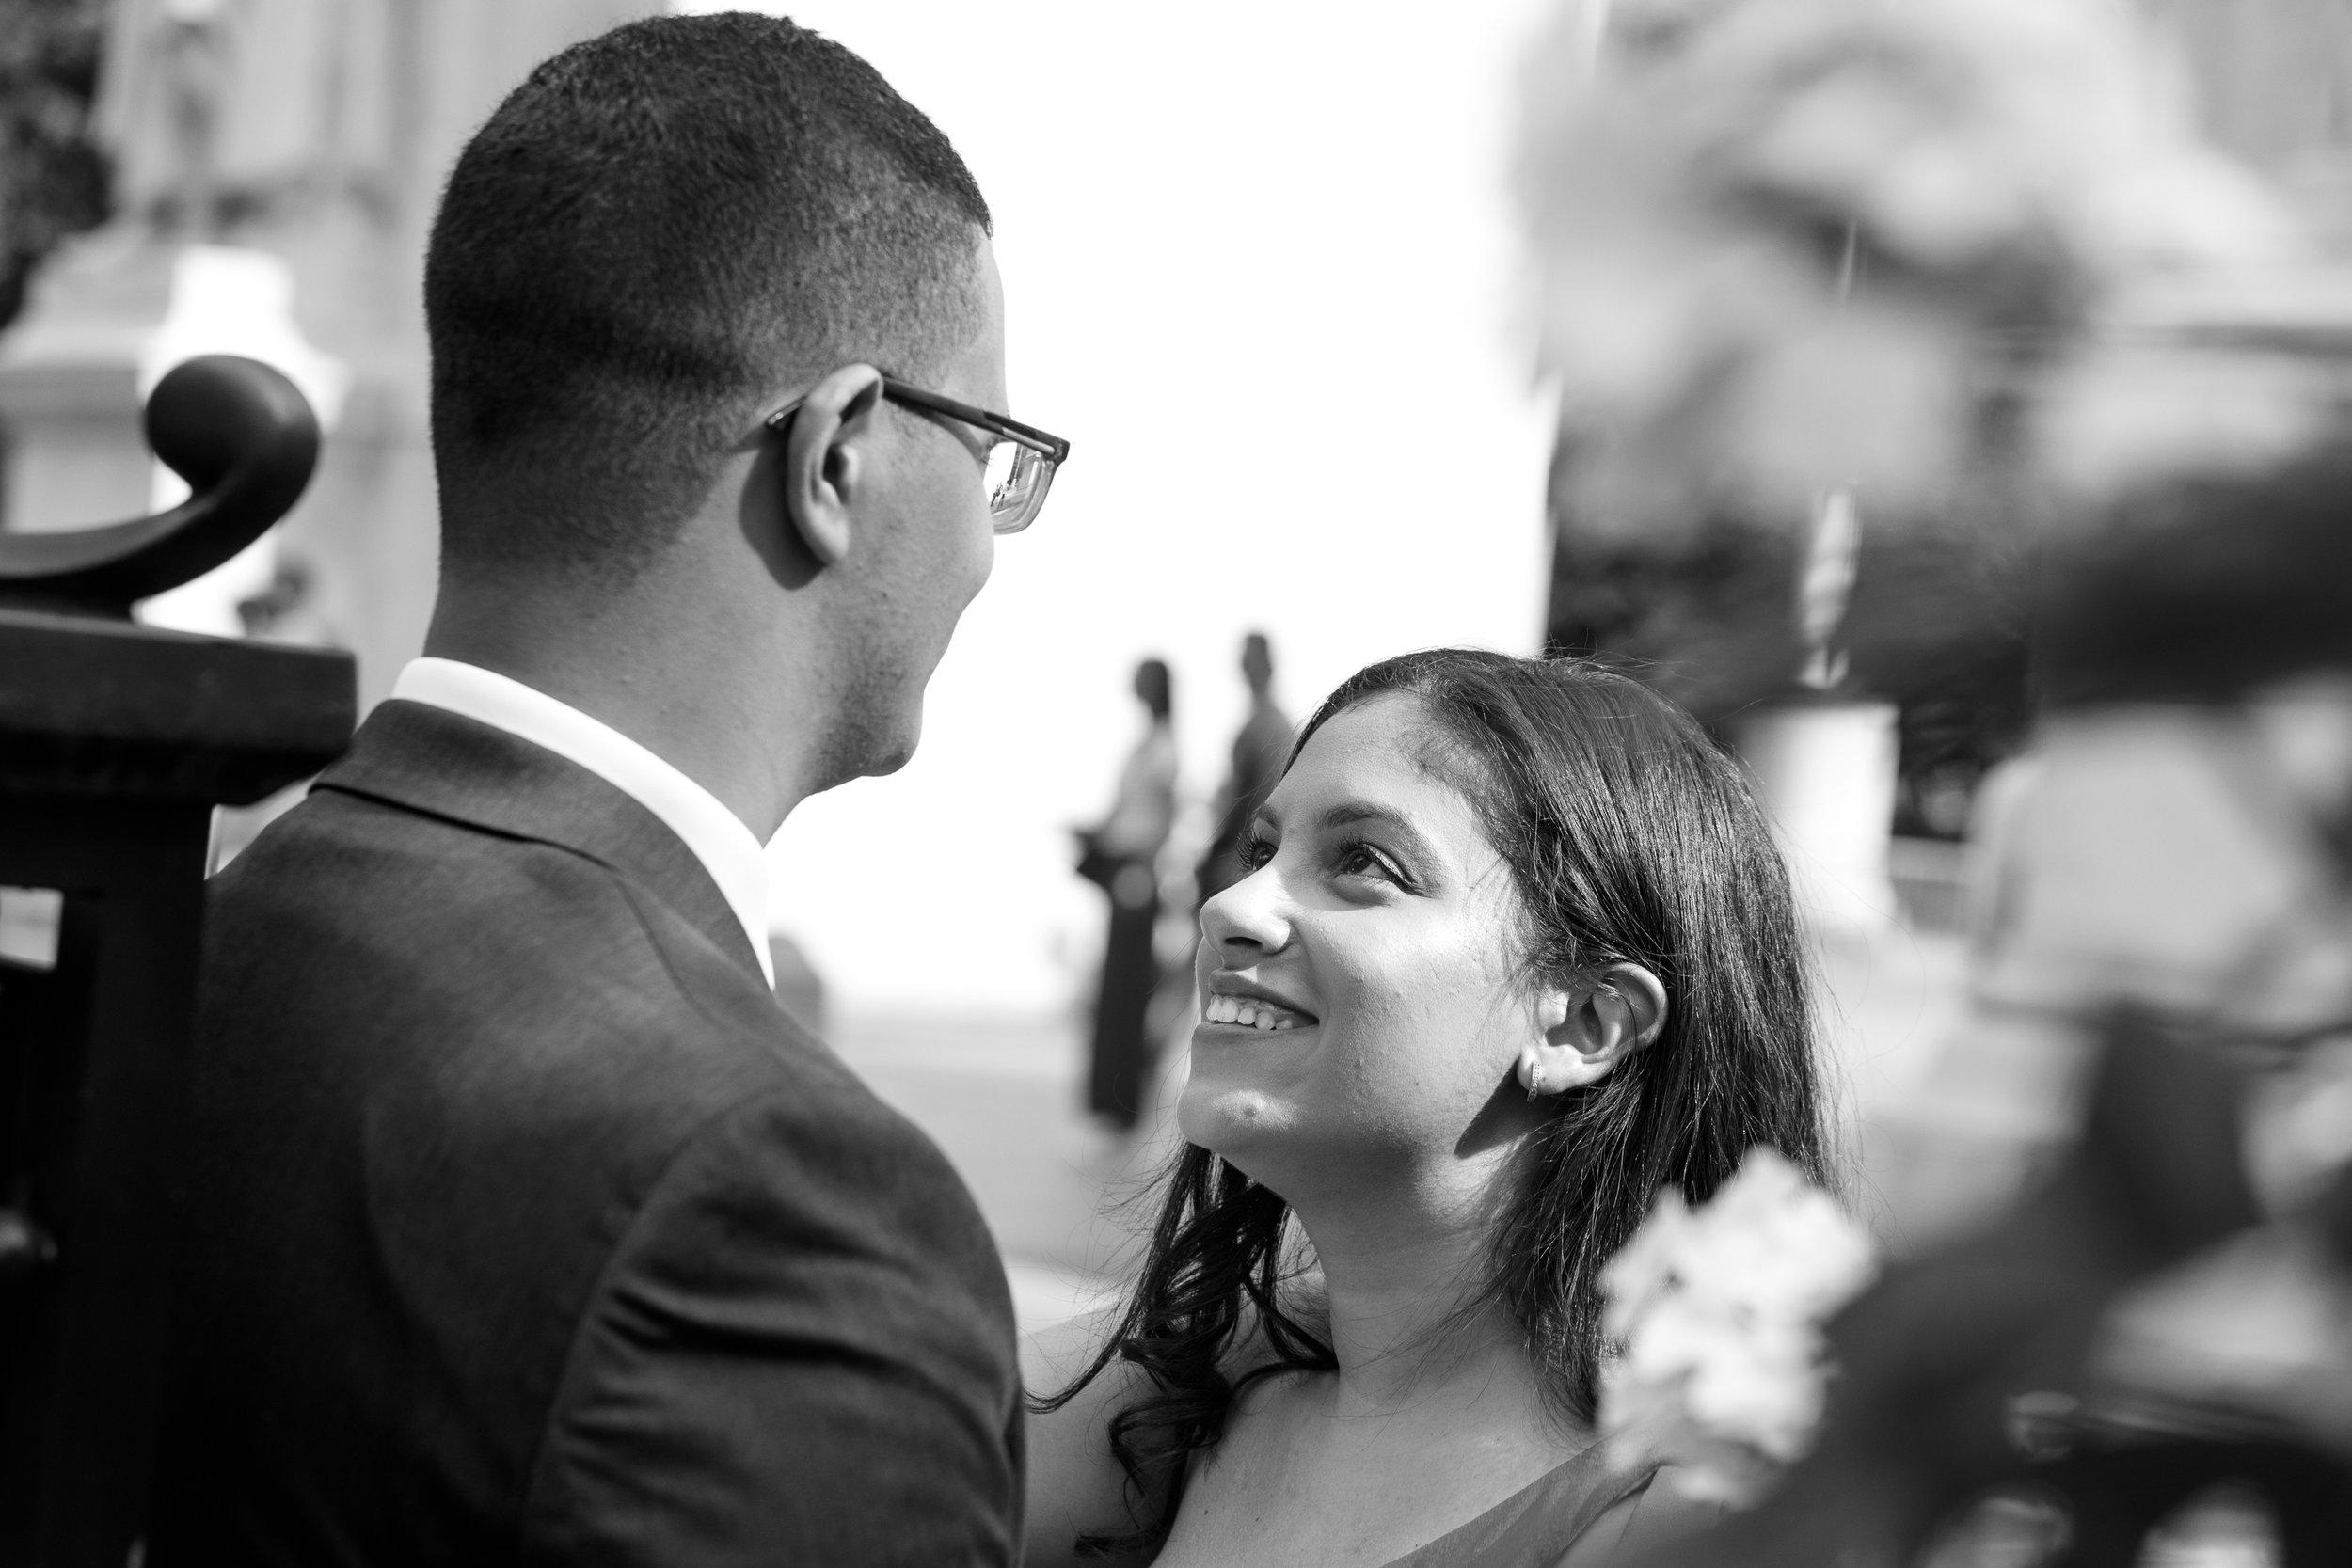 Kiro Rebecca Washington Square Park Marriage Proposal _ Jonathan Heisler _ 6152019 _036.jpg